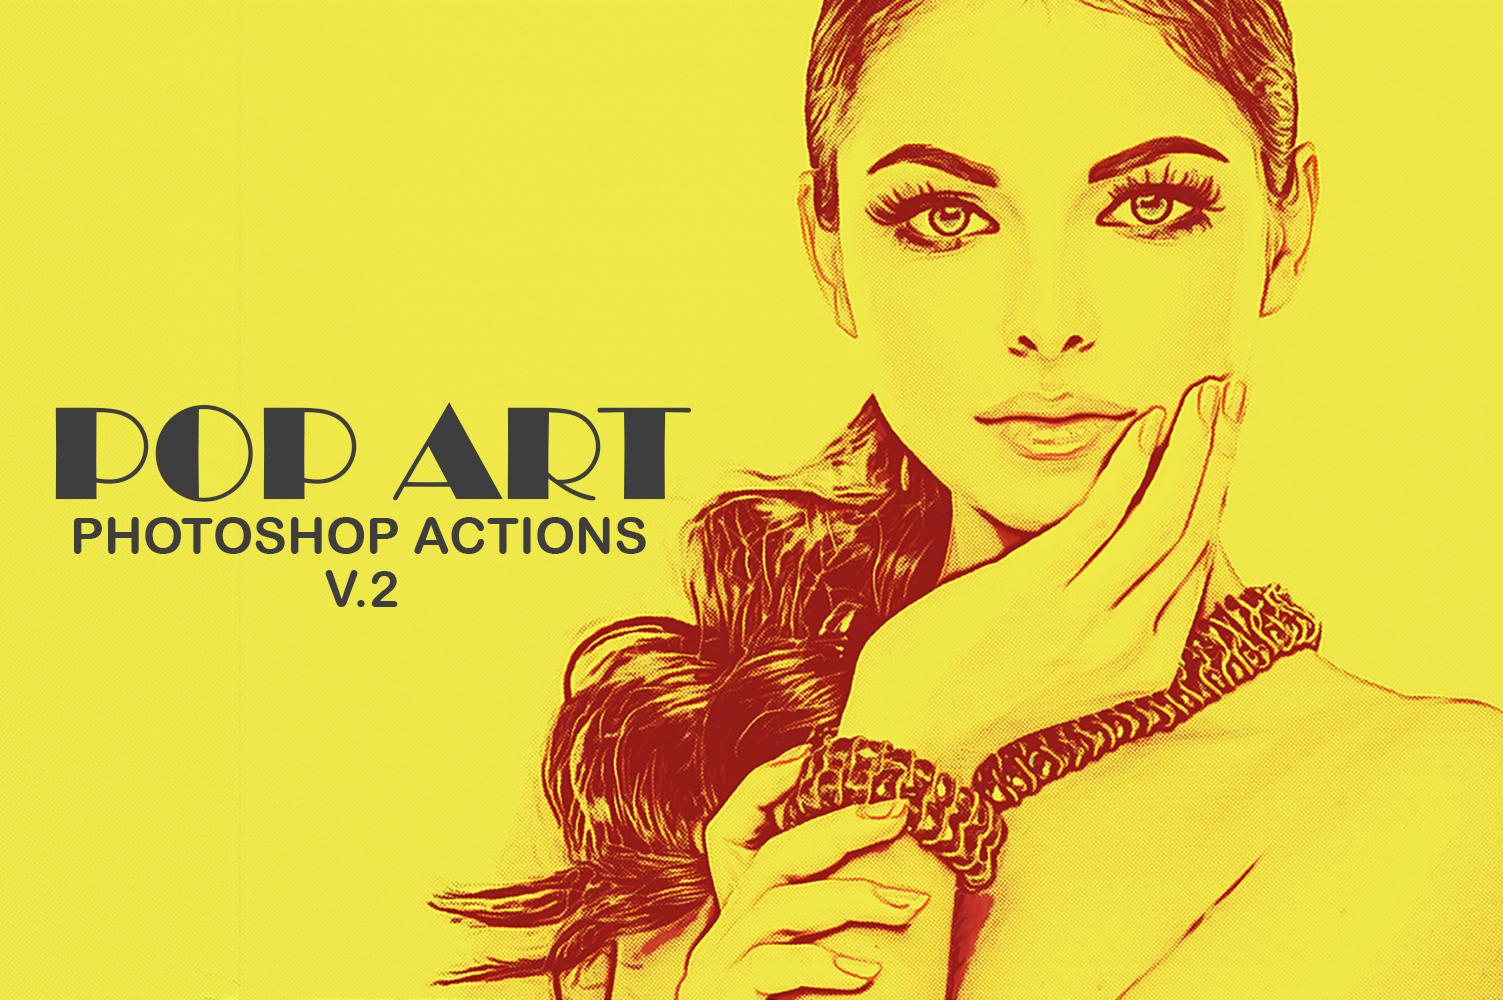 20 Pop Art Photoshop Actions Ver. 2 example image 1